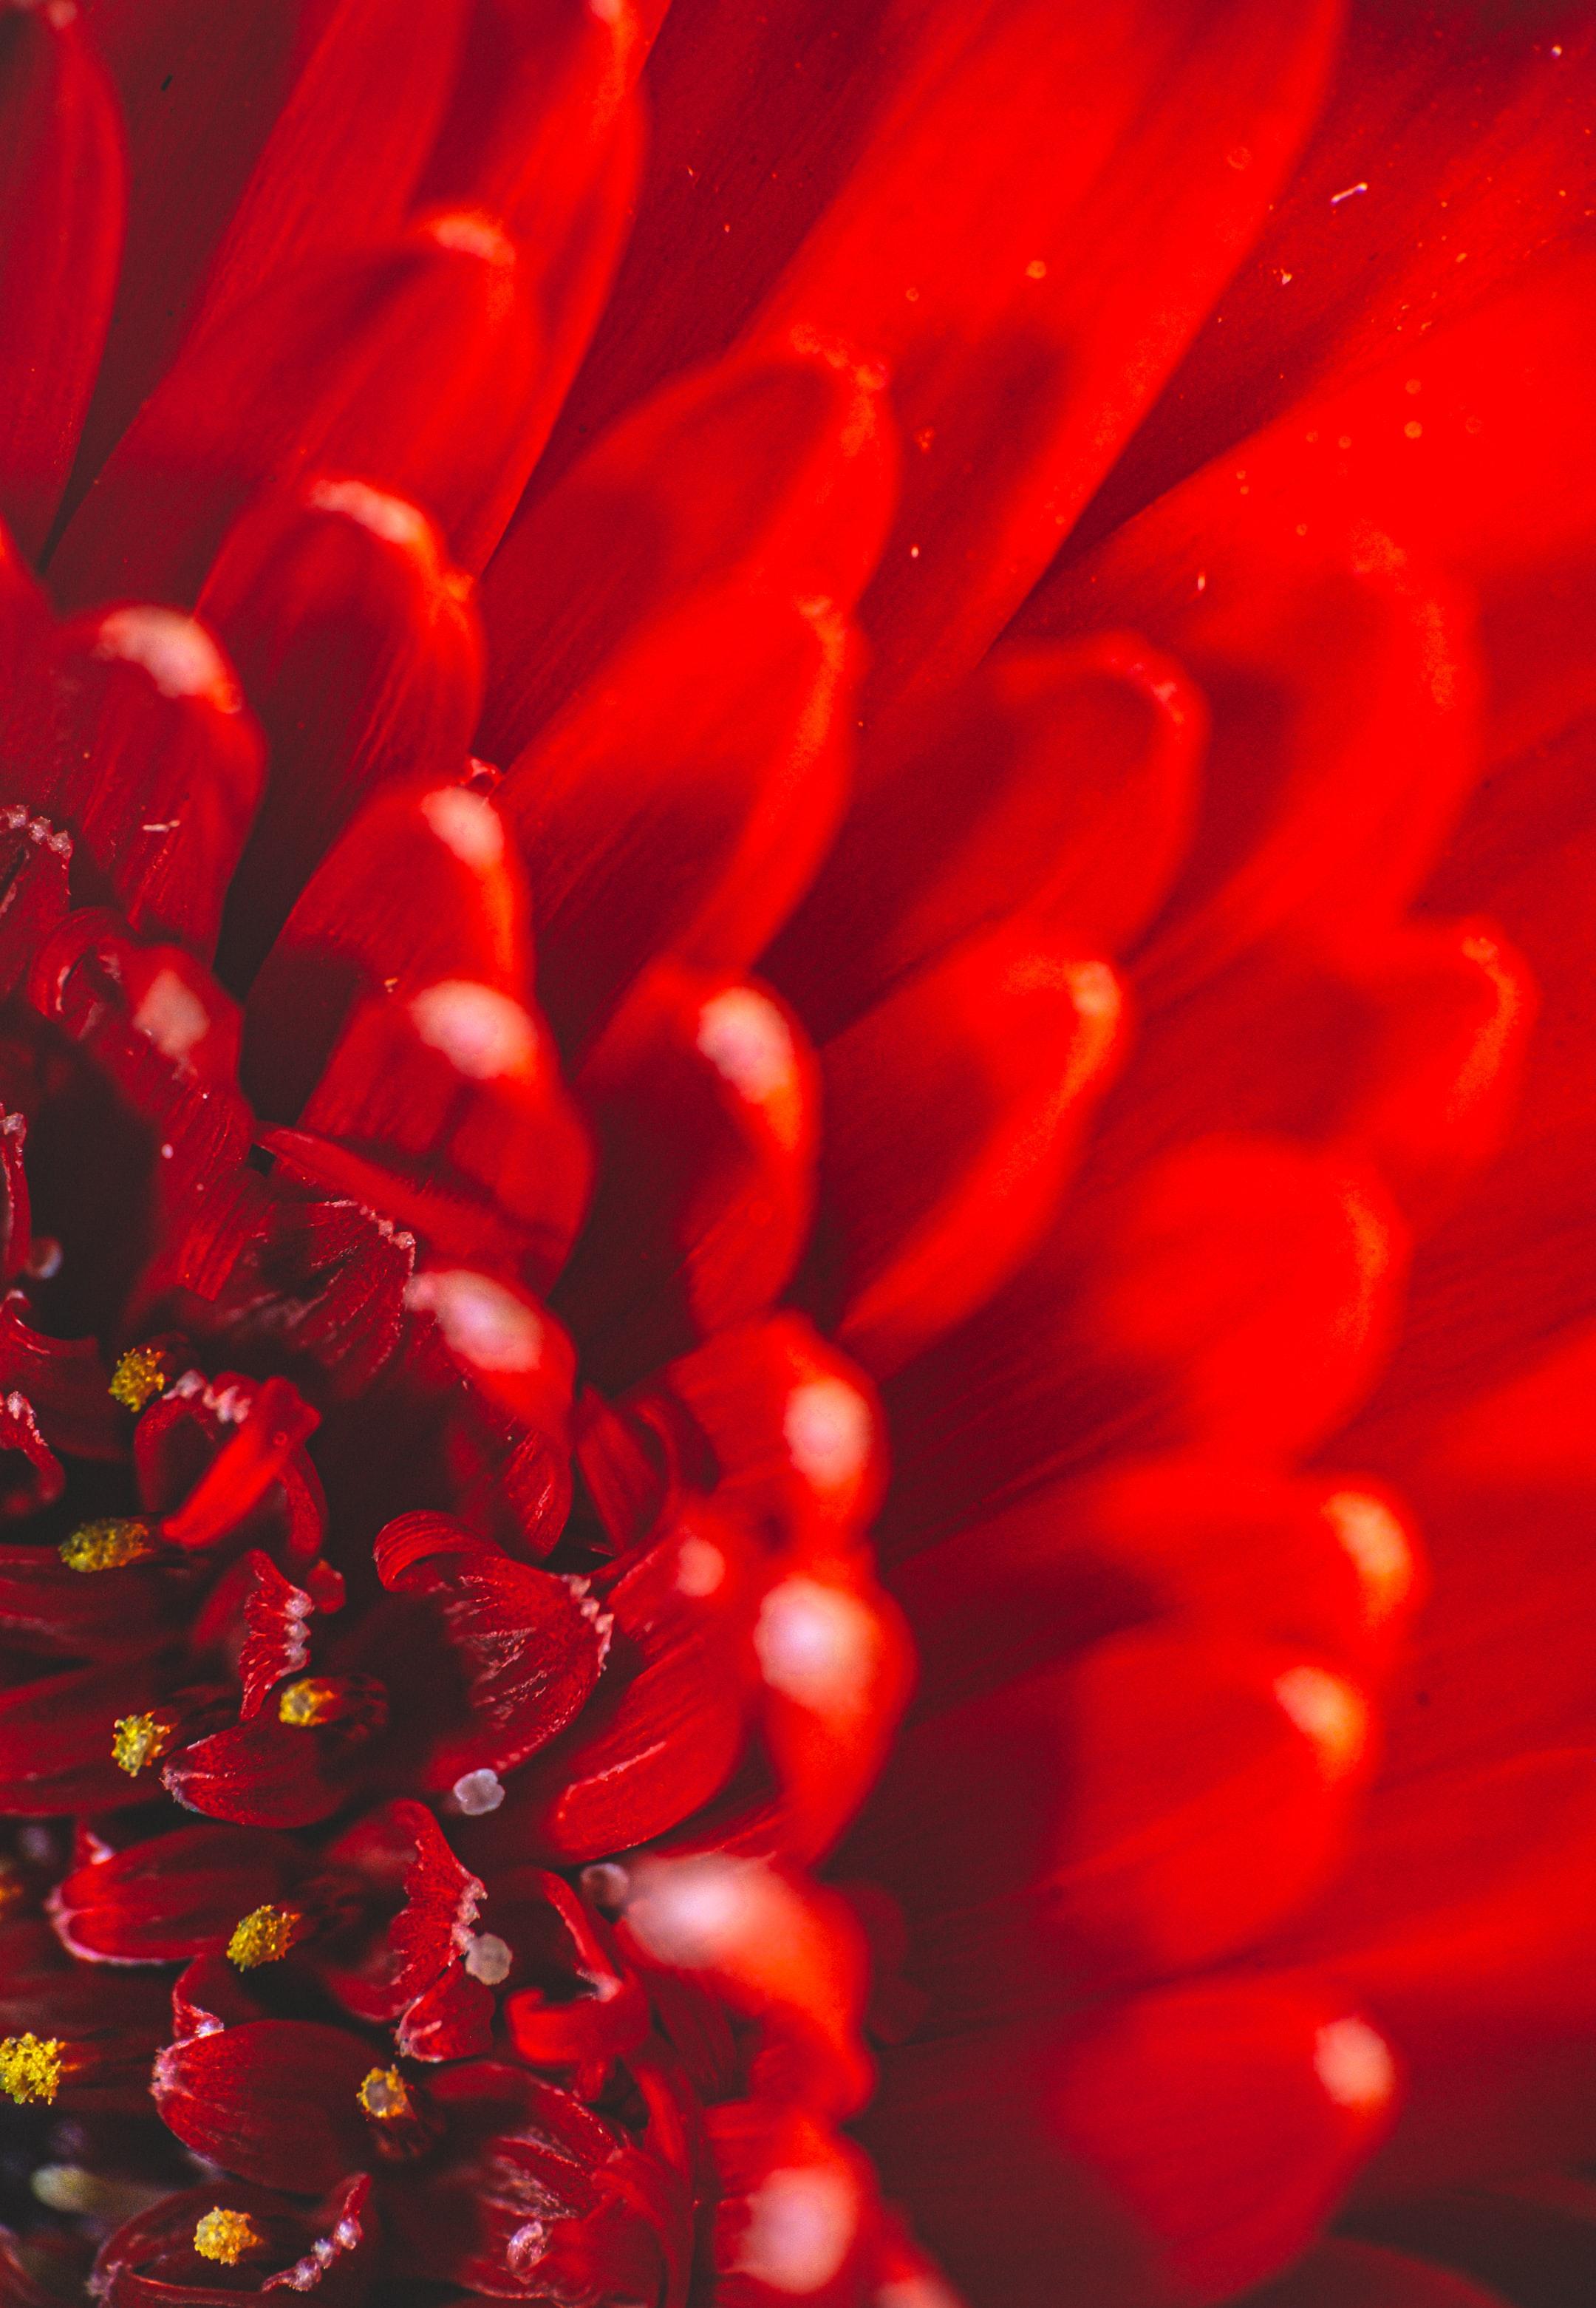 153593 download wallpaper Macro, Chrysanthemum, Flower, Petals screensavers and pictures for free